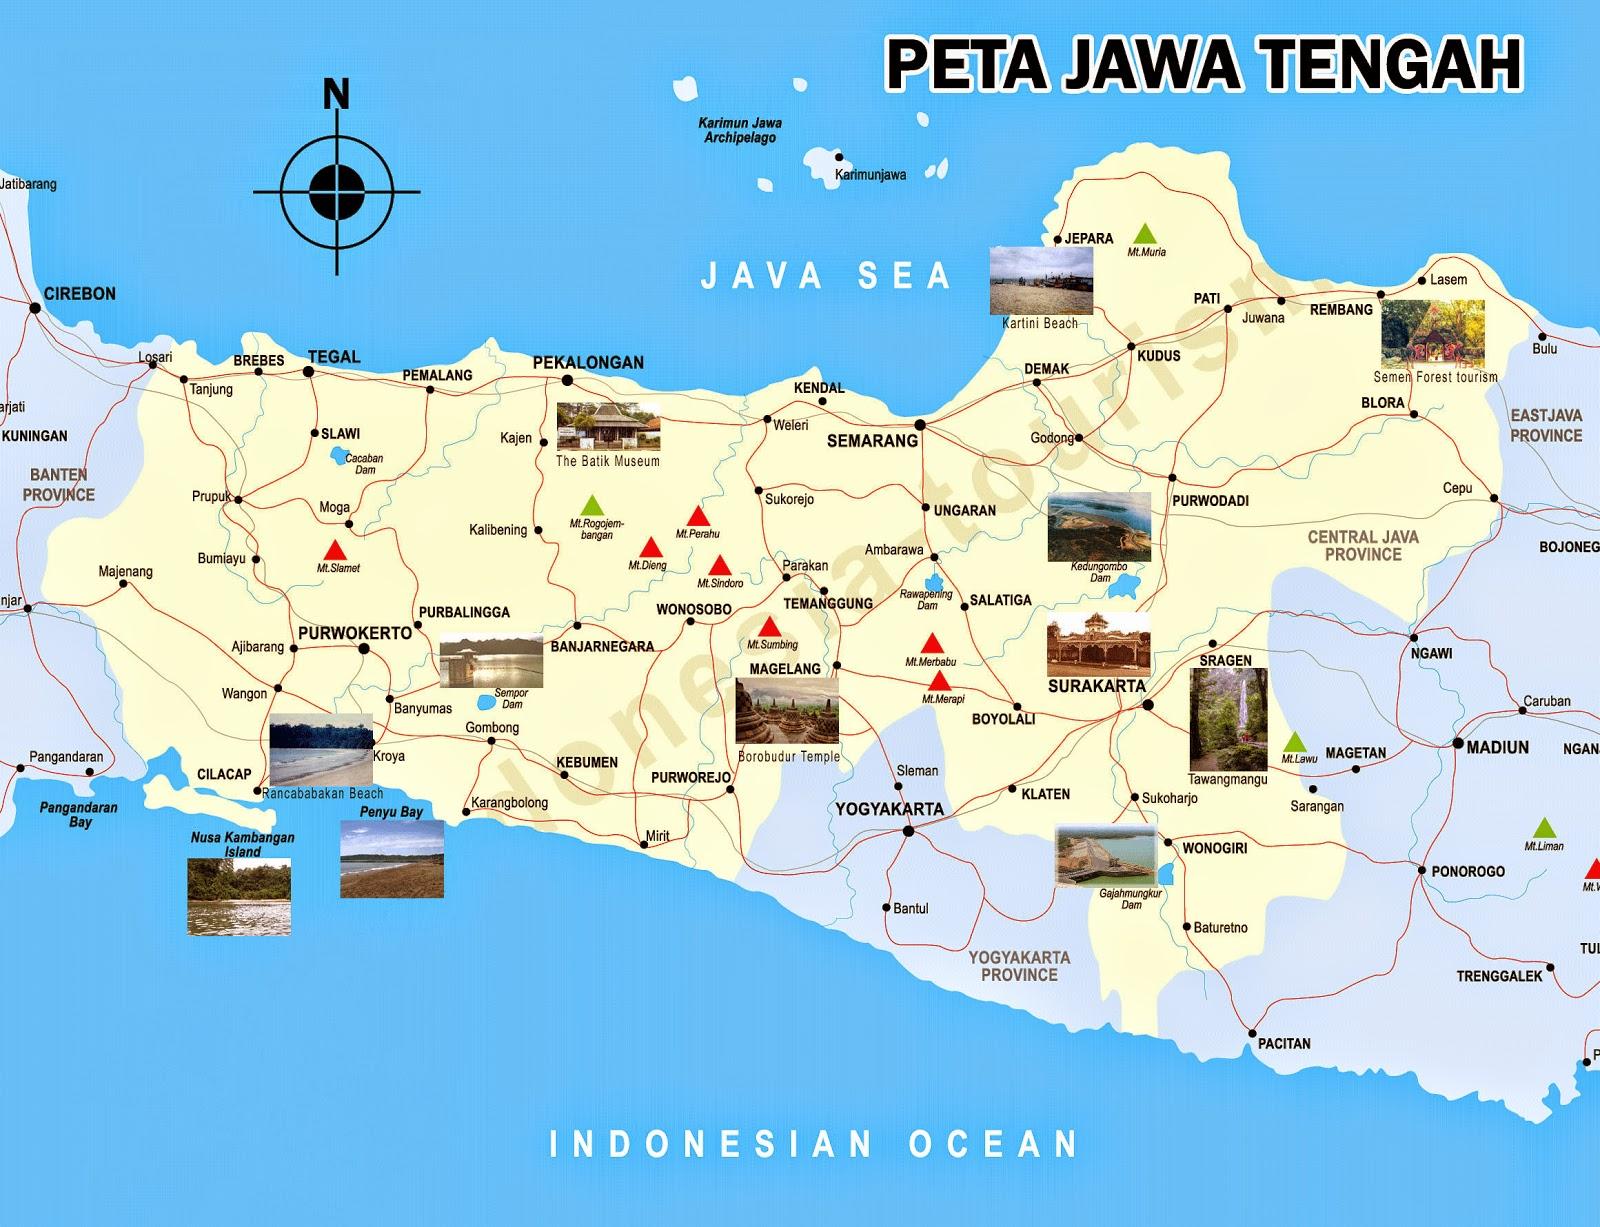 peta-provinsi-jawa-tengah-dengan-29-provinsi-dan-6-kota